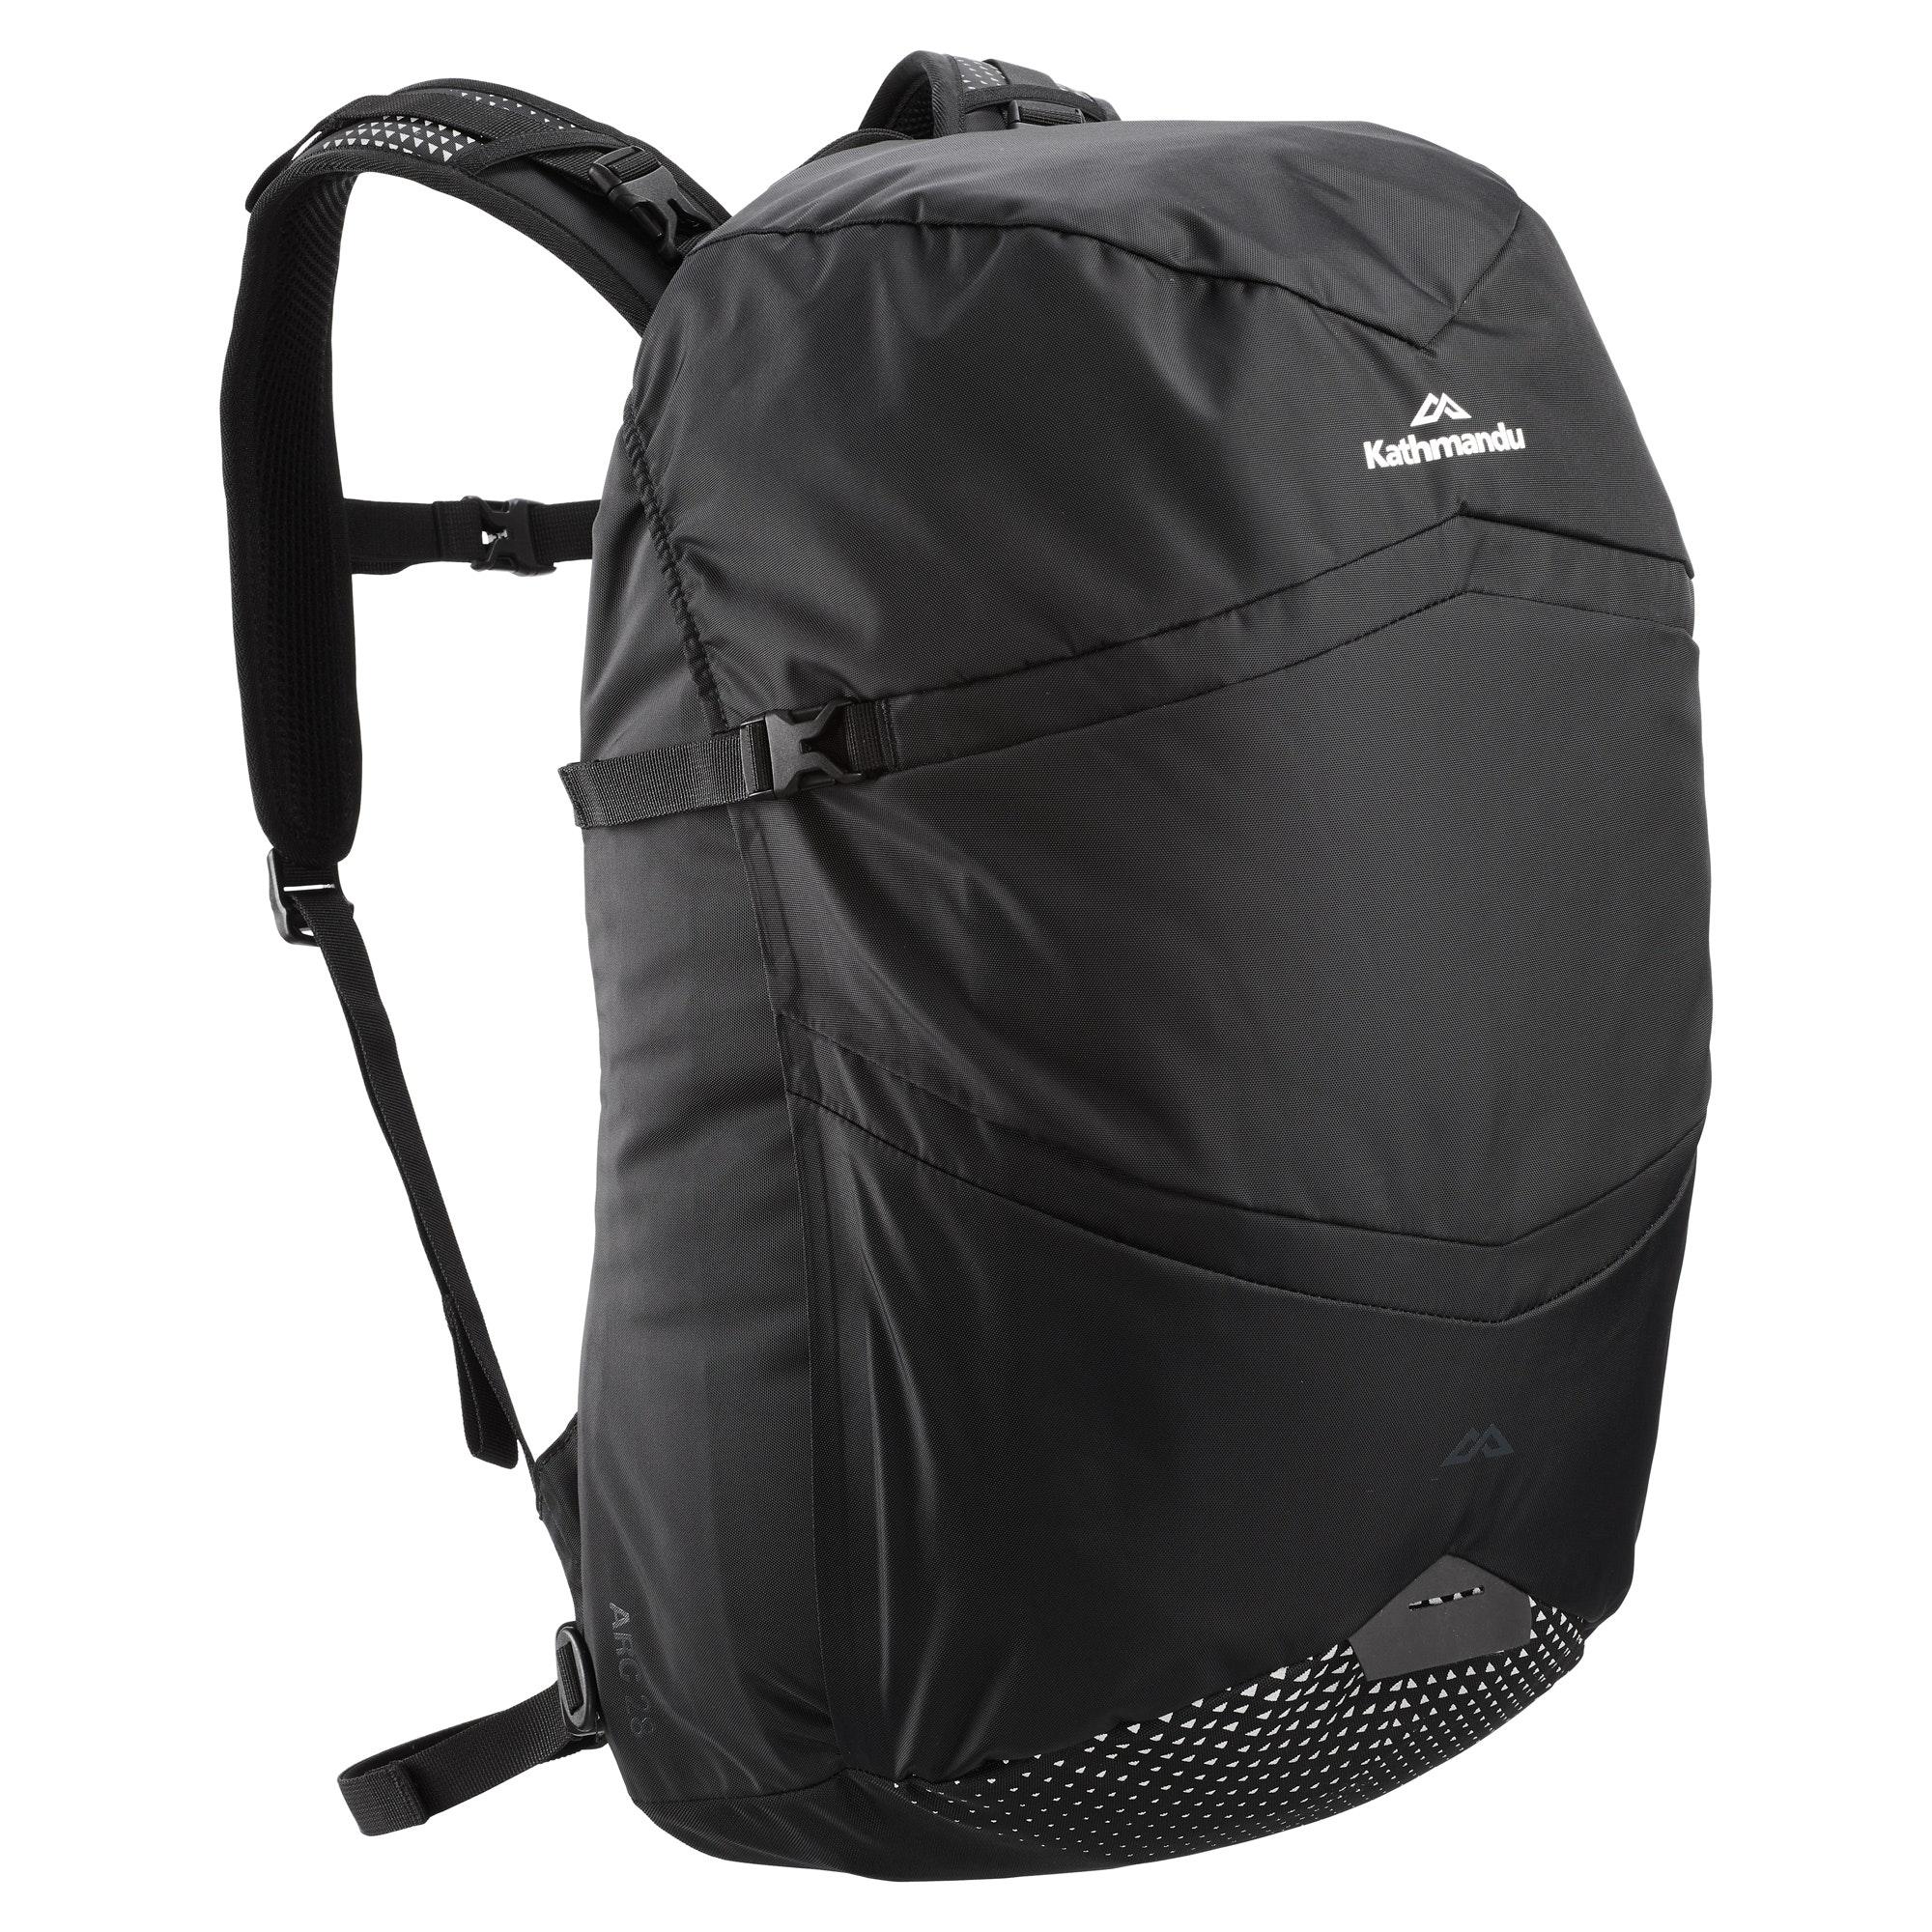 7e8c1c161f62 Backpack Brand New Zealand- Fenix Toulouse Handball